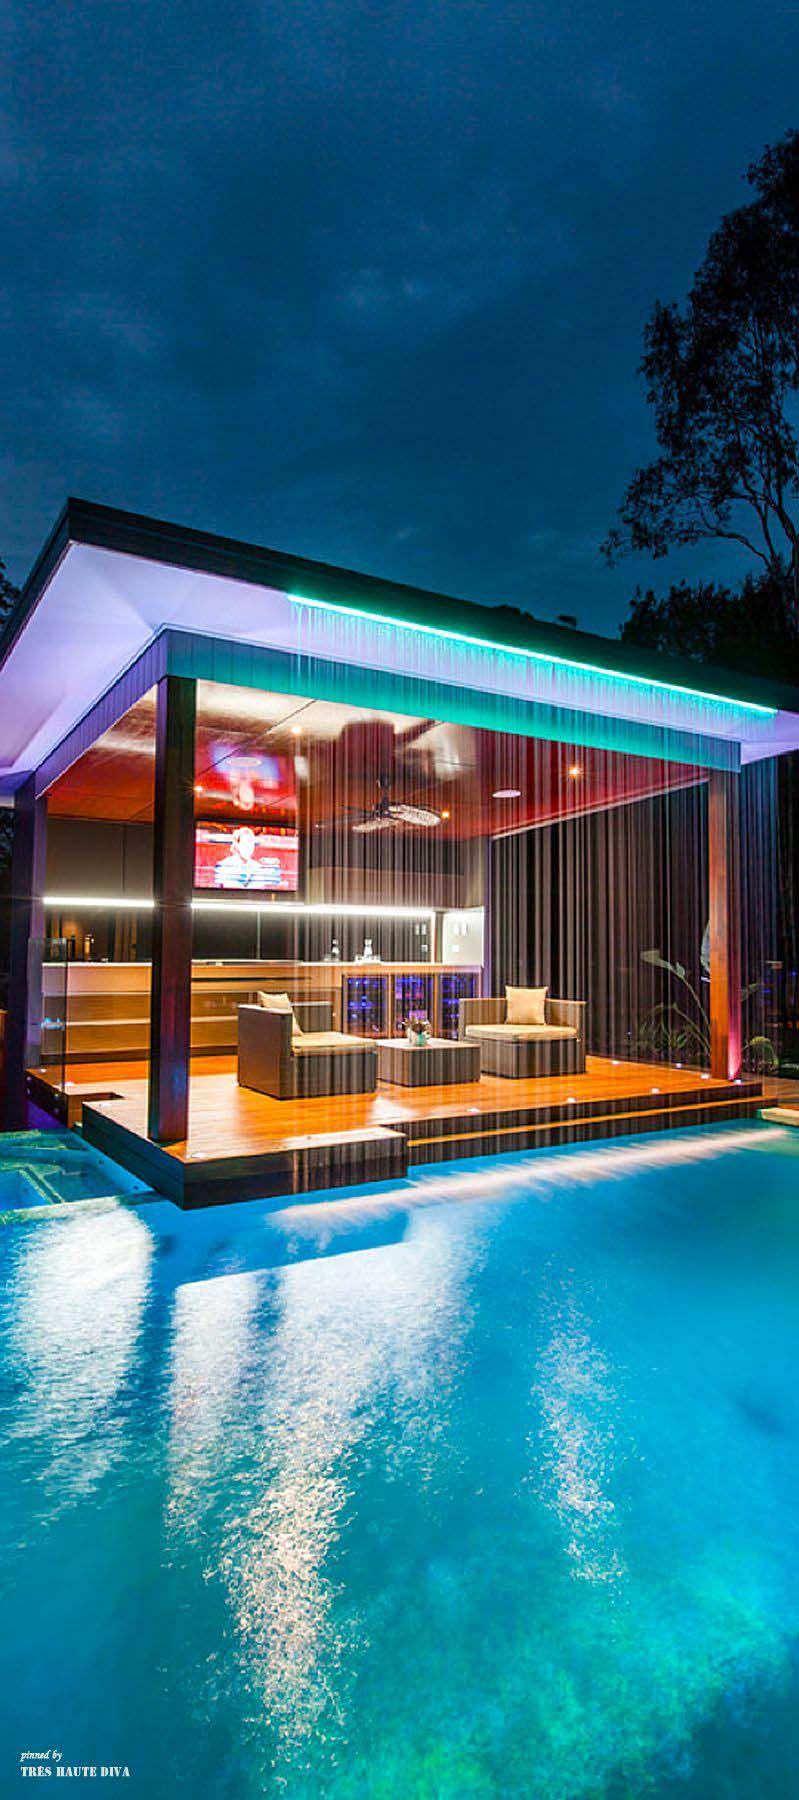 20+ Wonderful Outdoor Pool Decorations Ideas   Pool houses, Best ...